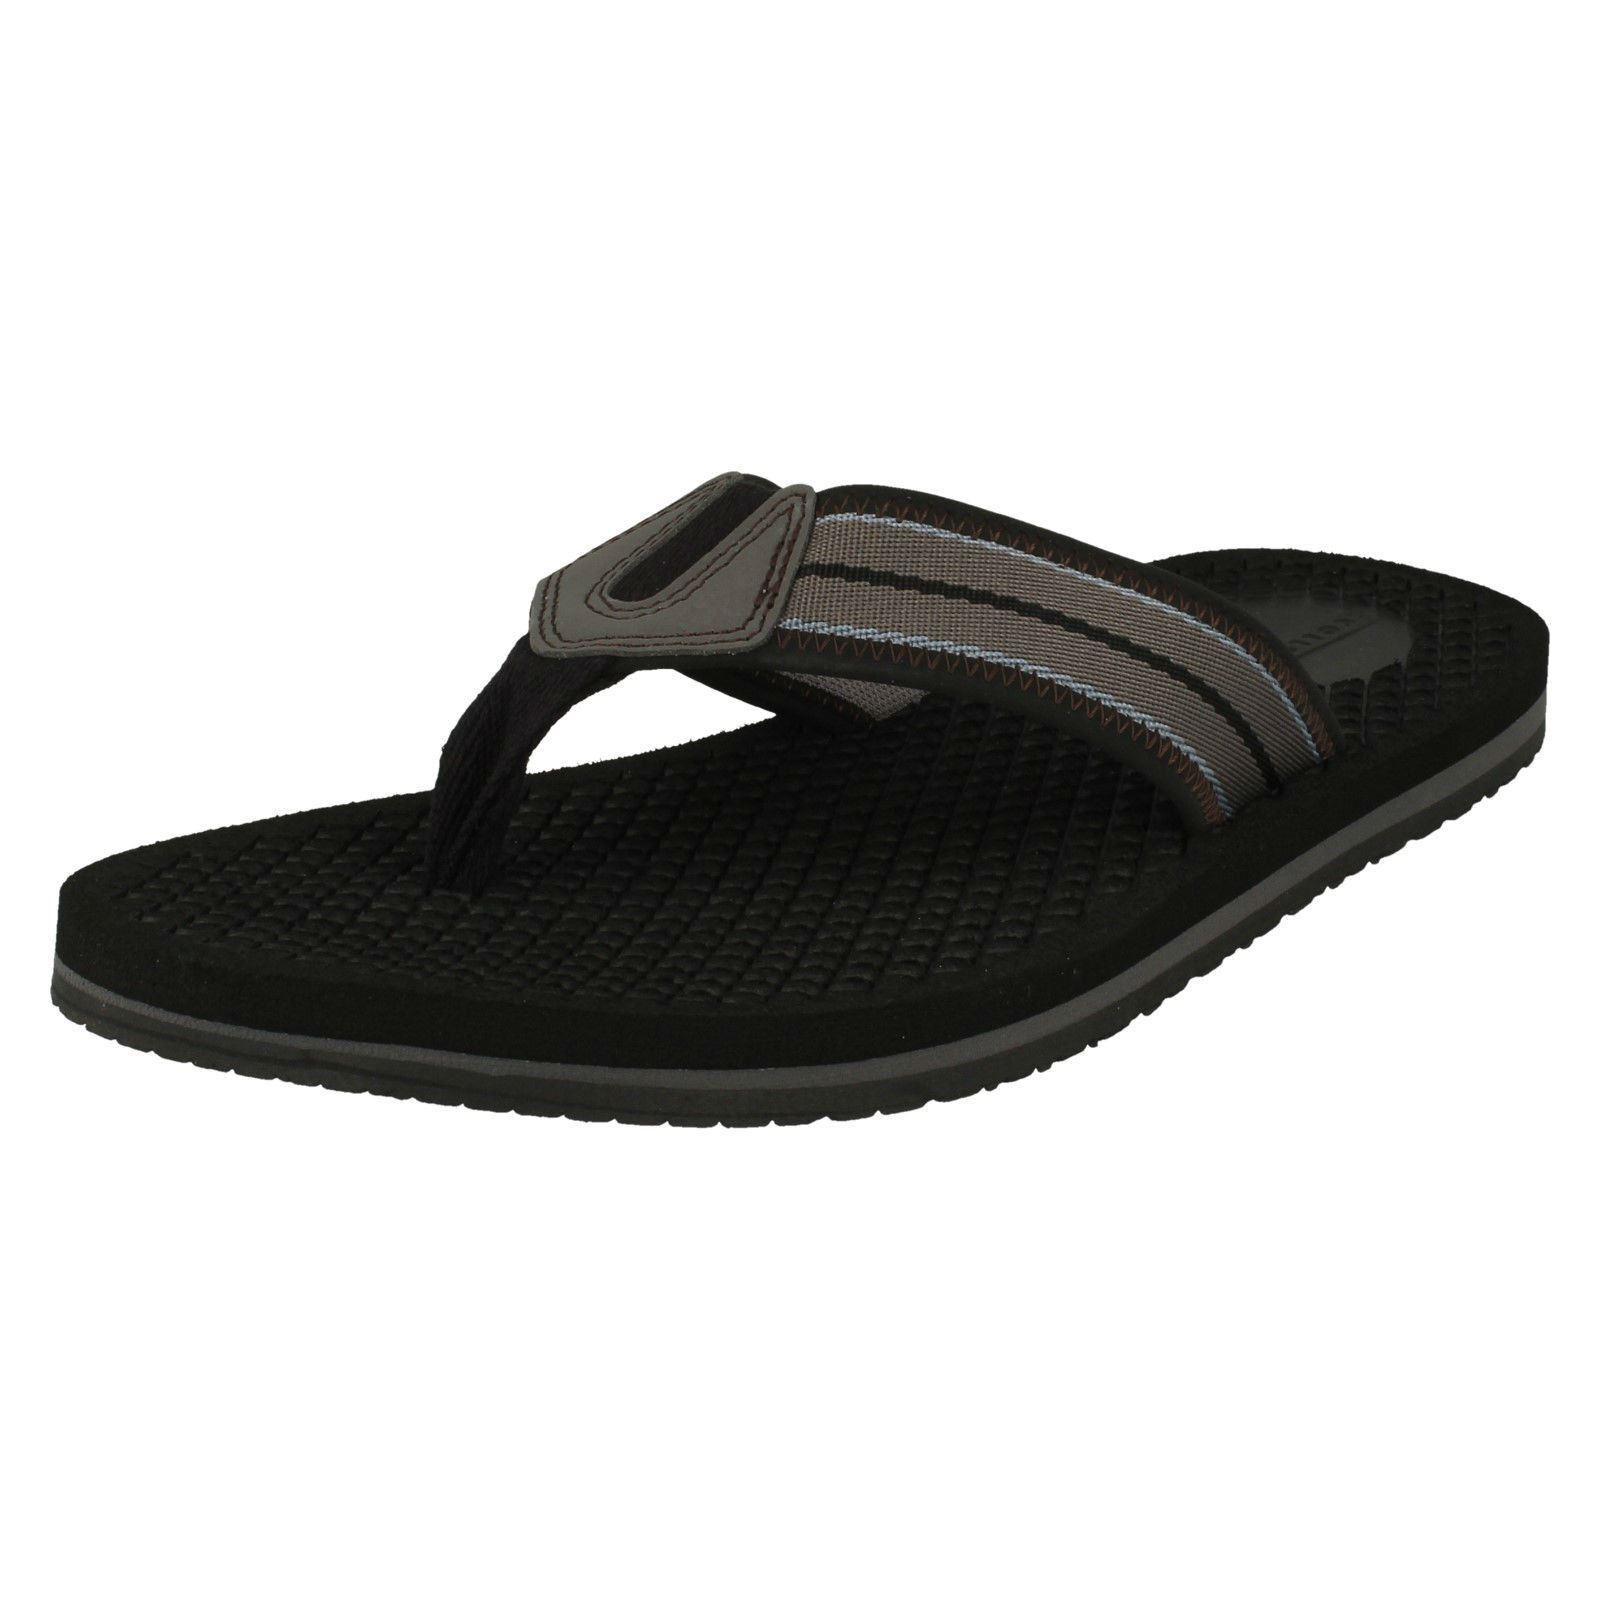 a57d0ed35fb4 Mens Clarks Stylish Toe-post Sandals Levick Post UK 8 Black G for ...